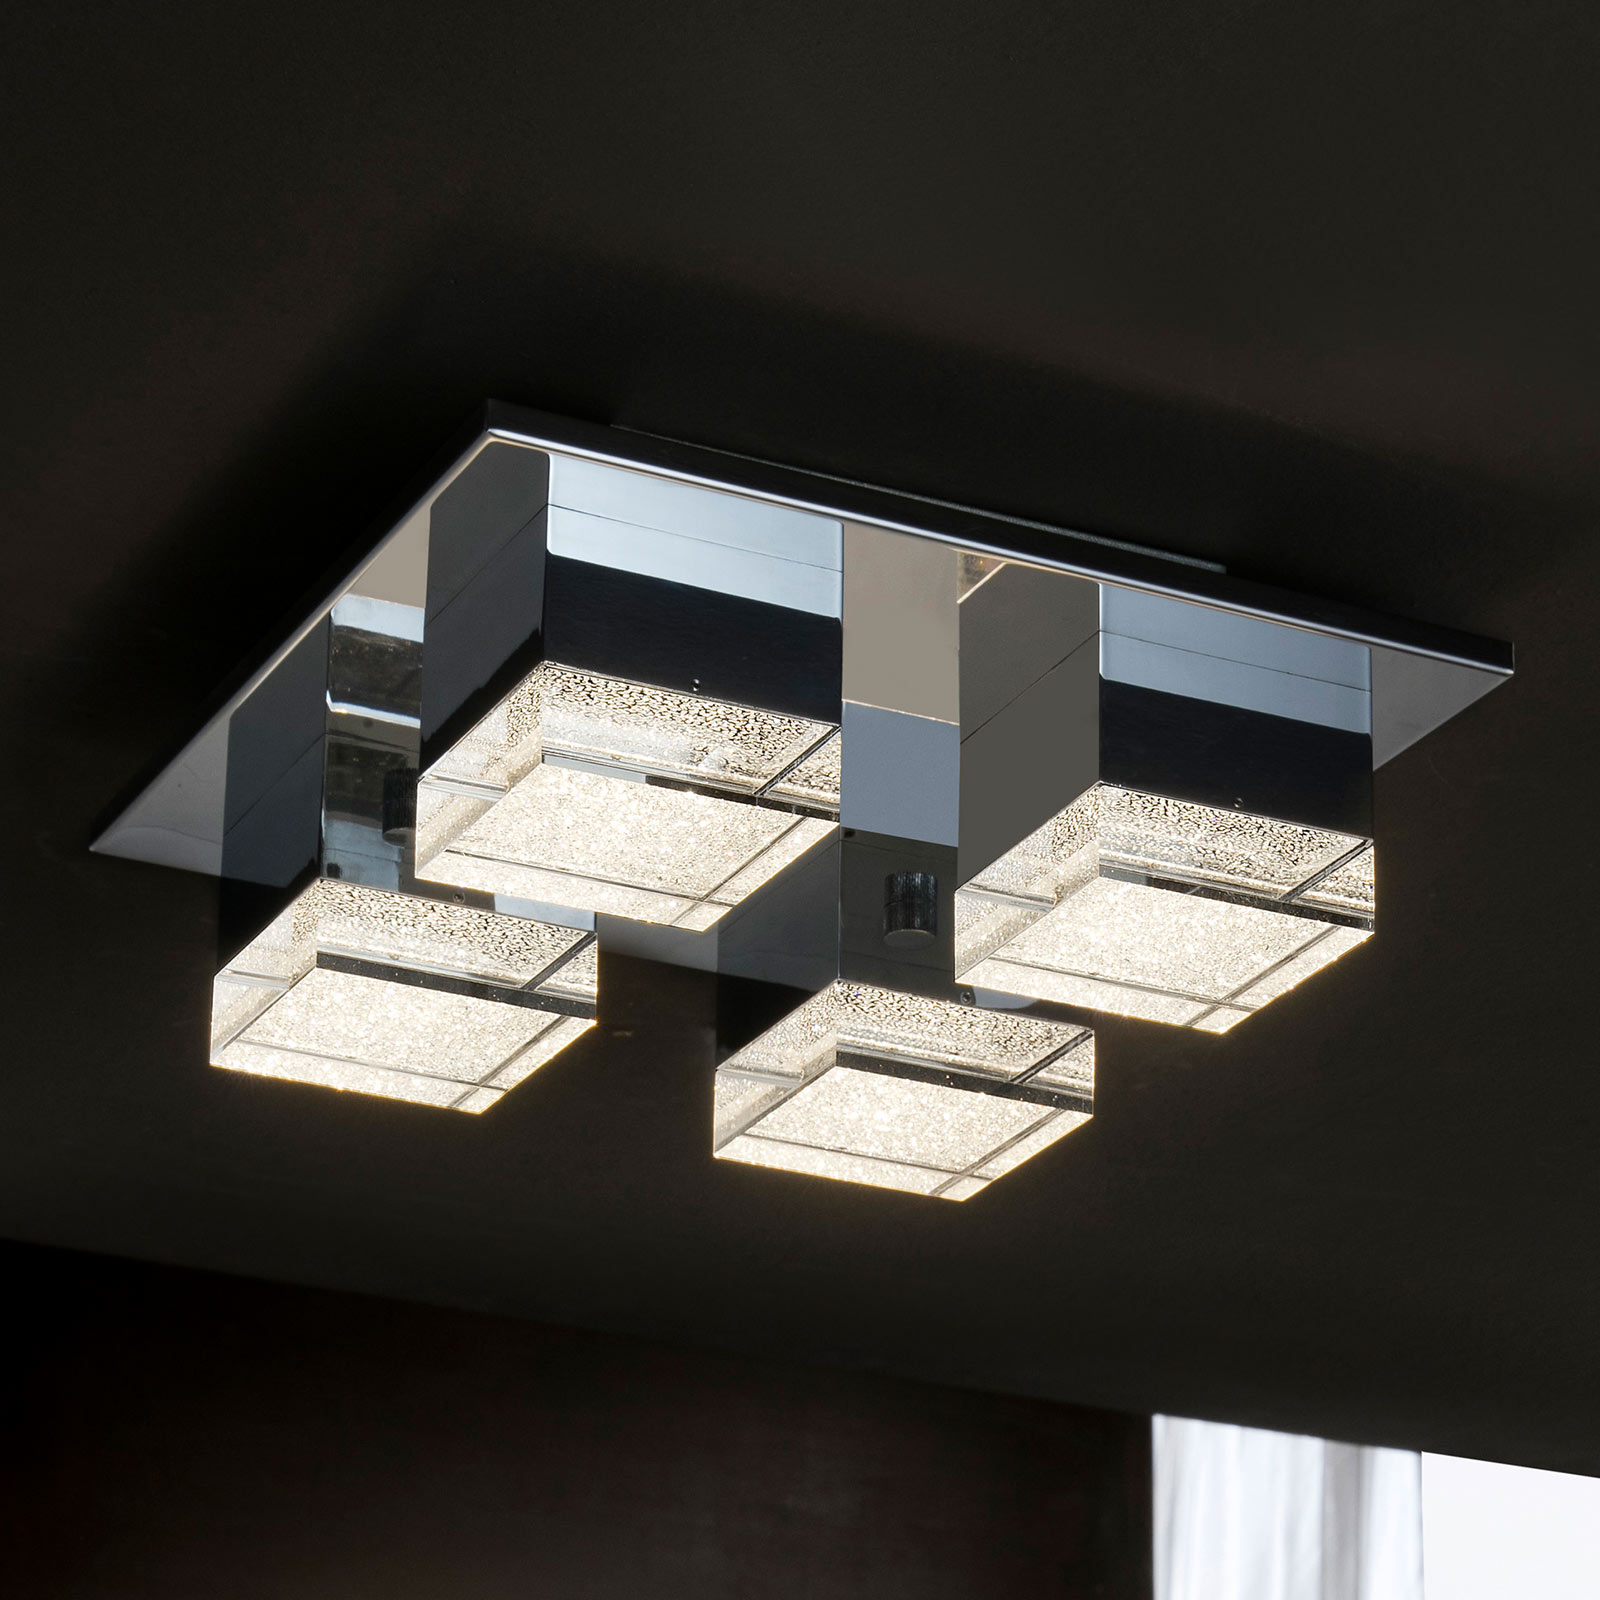 LED-taklampe Prisma, 4 lyskilder